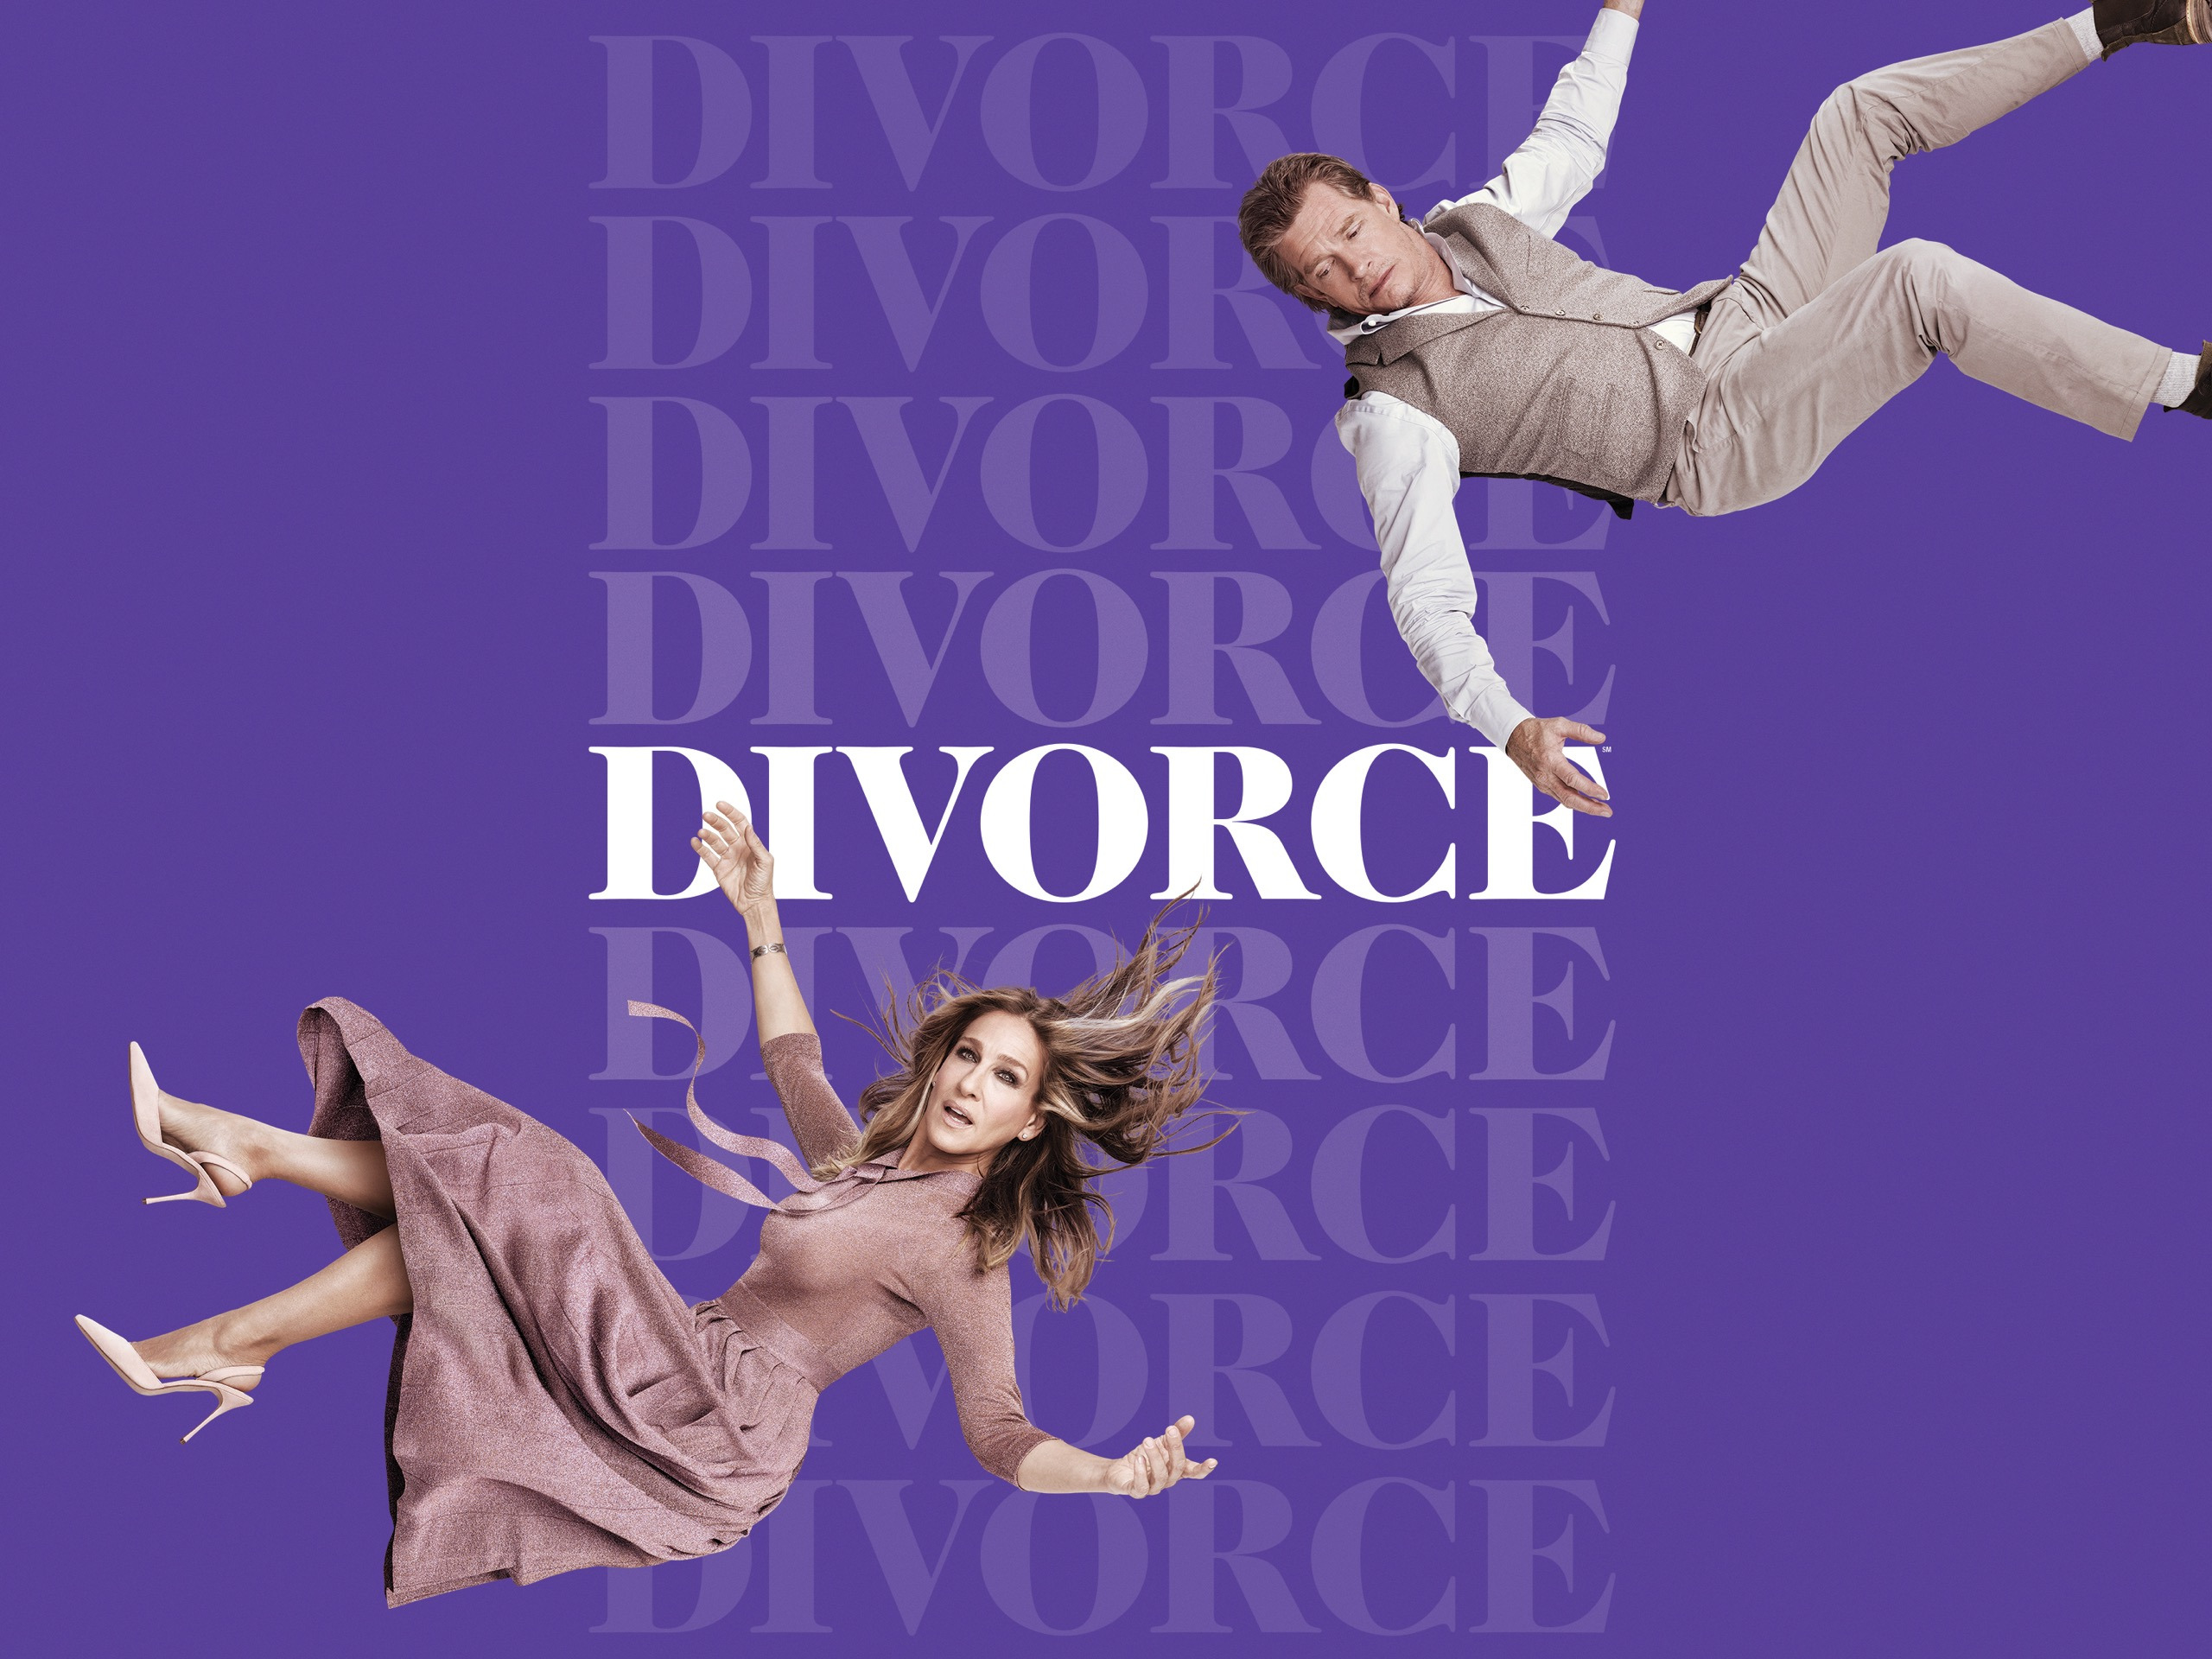 site rencontre divorce